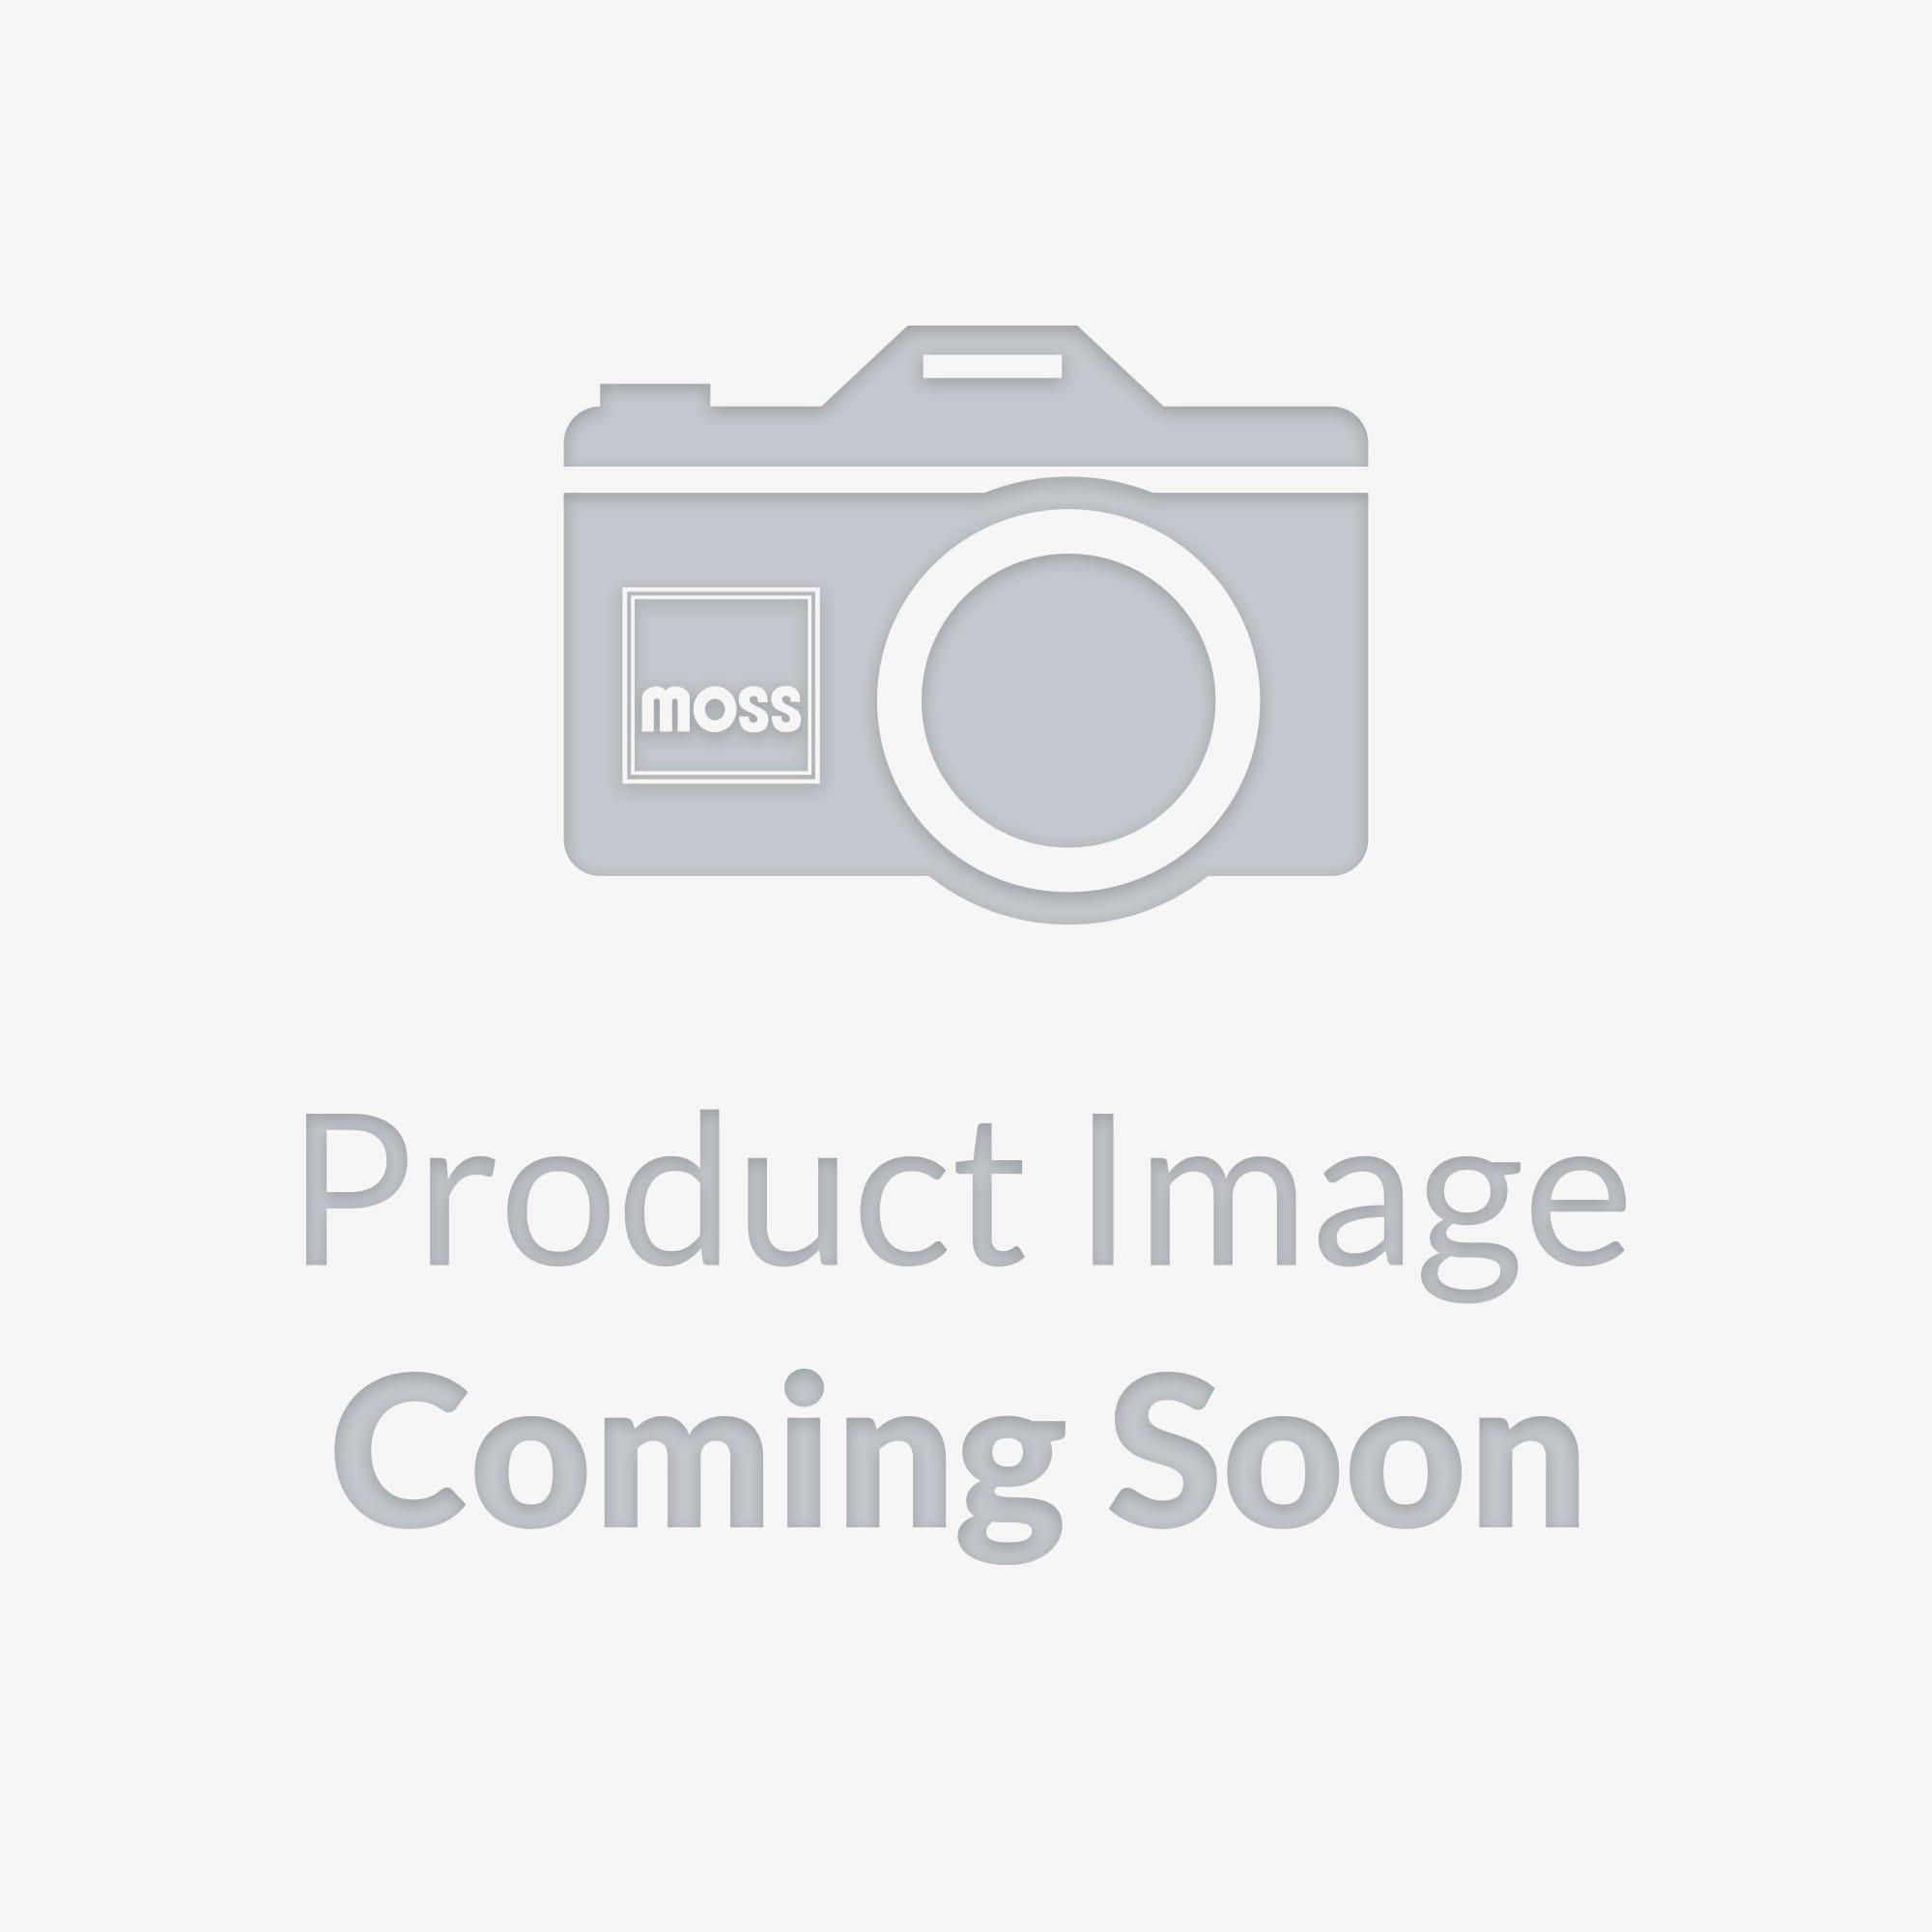 181-855 DIODE, handbrake warning light, inline | Moss Motors